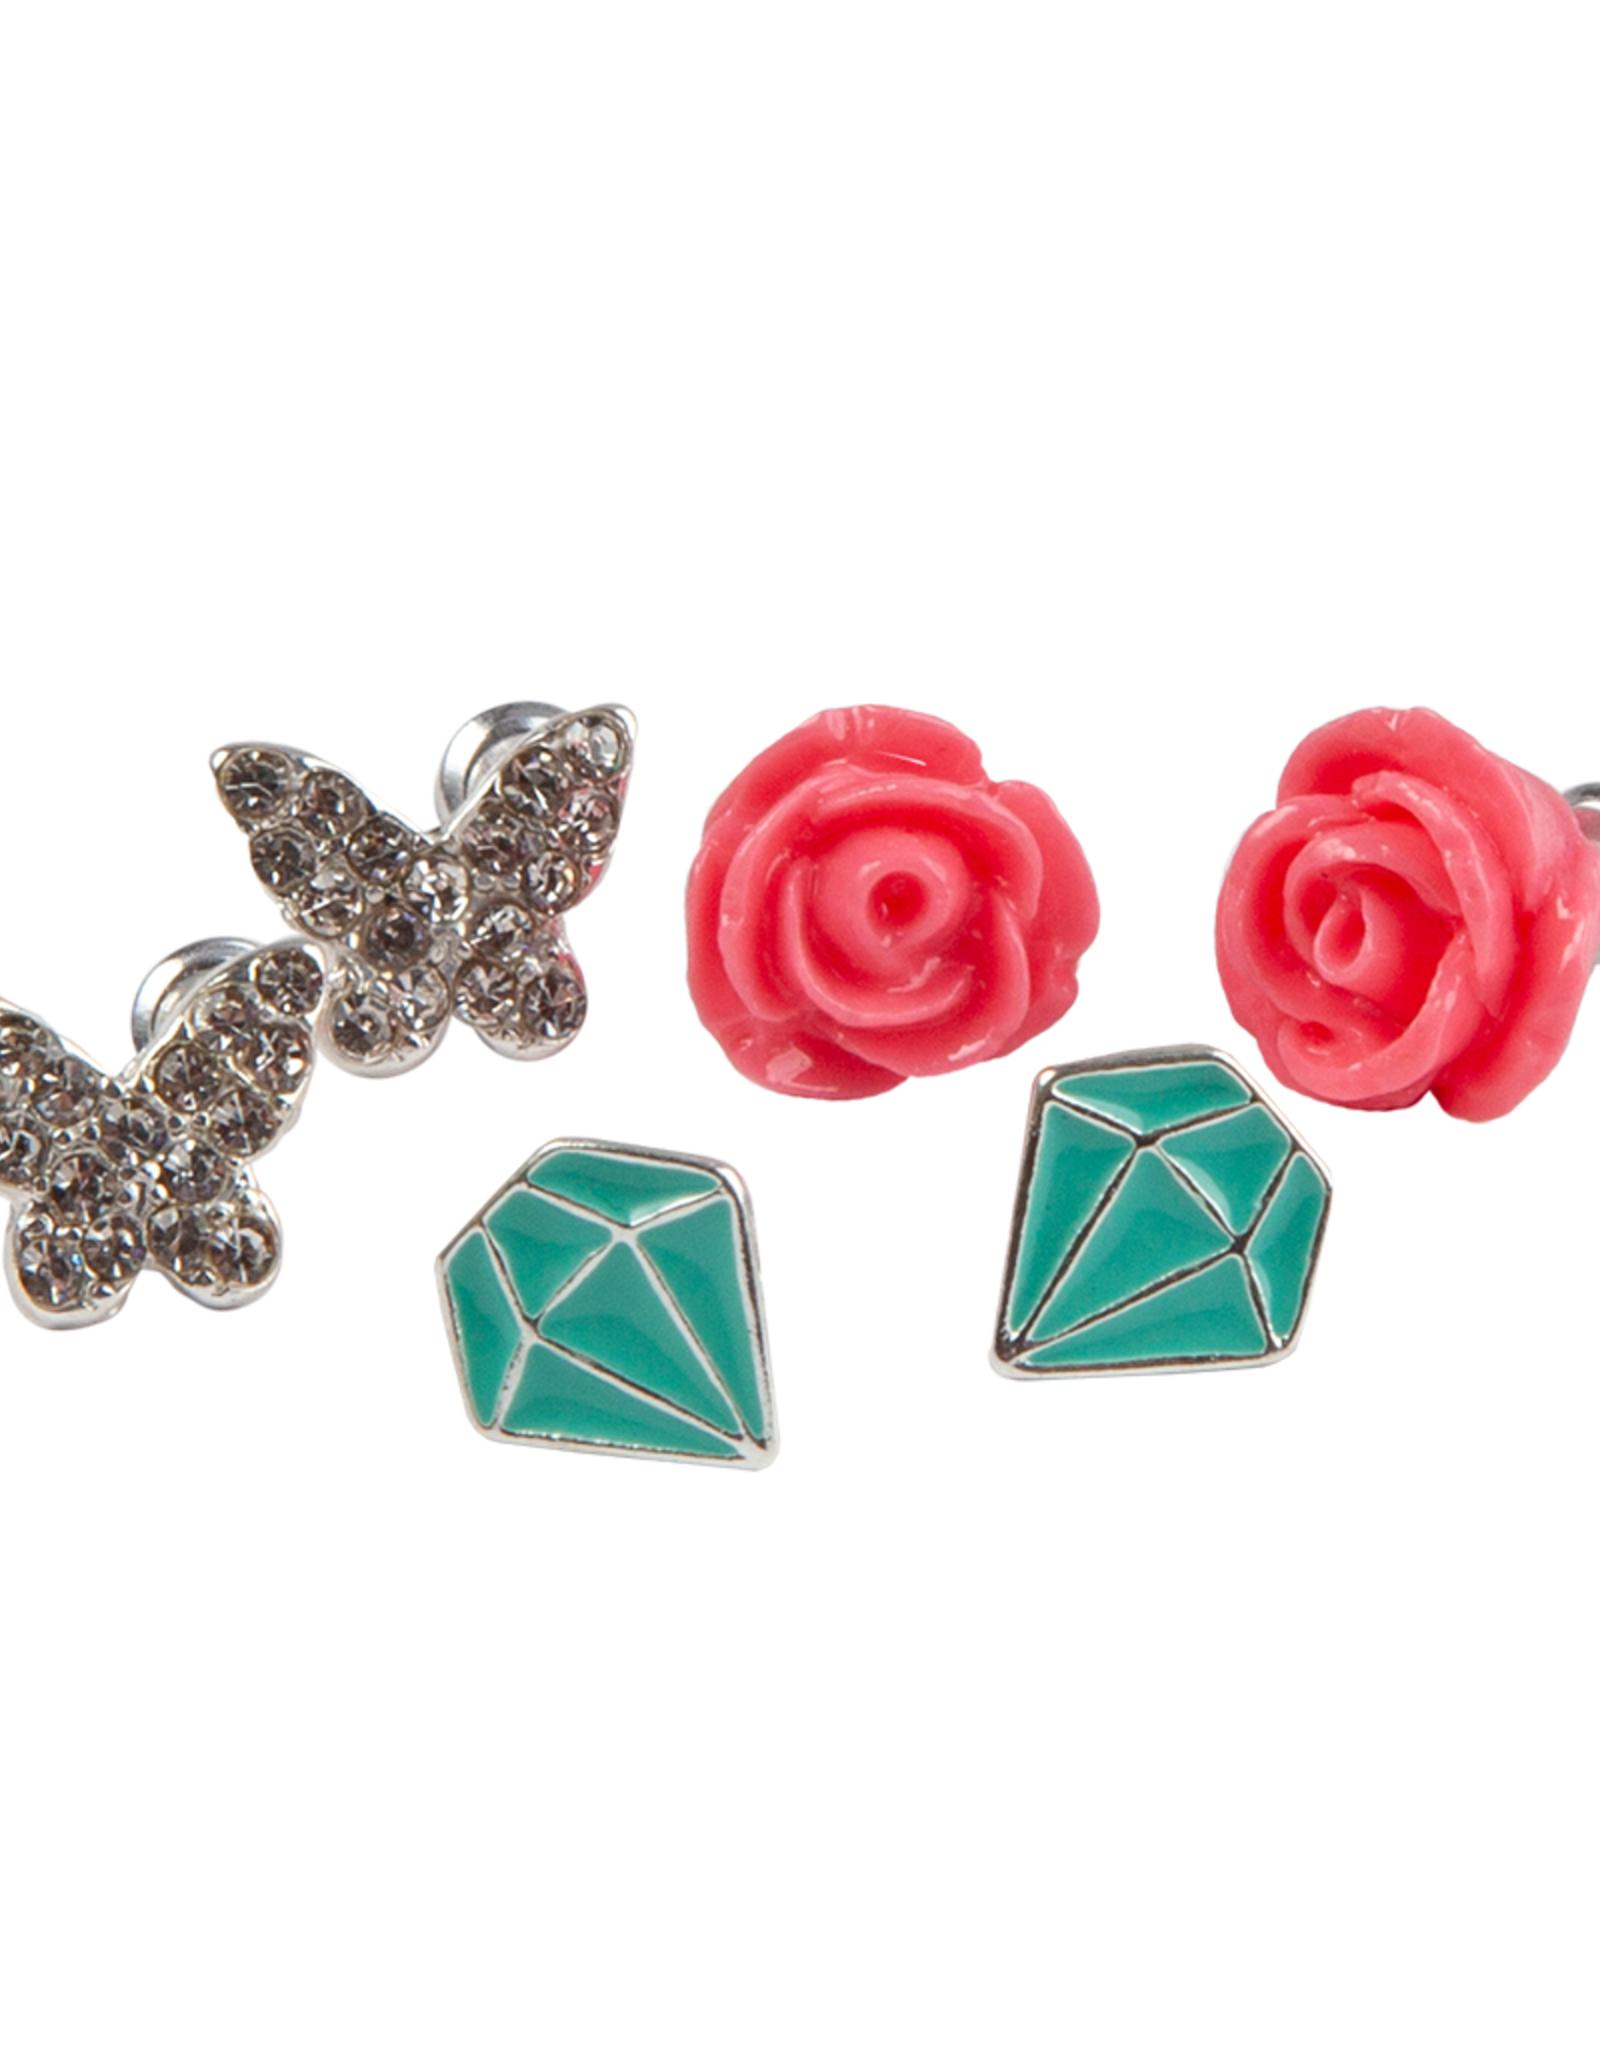 Great Pretenders Rose Studded Earrings, set of 3